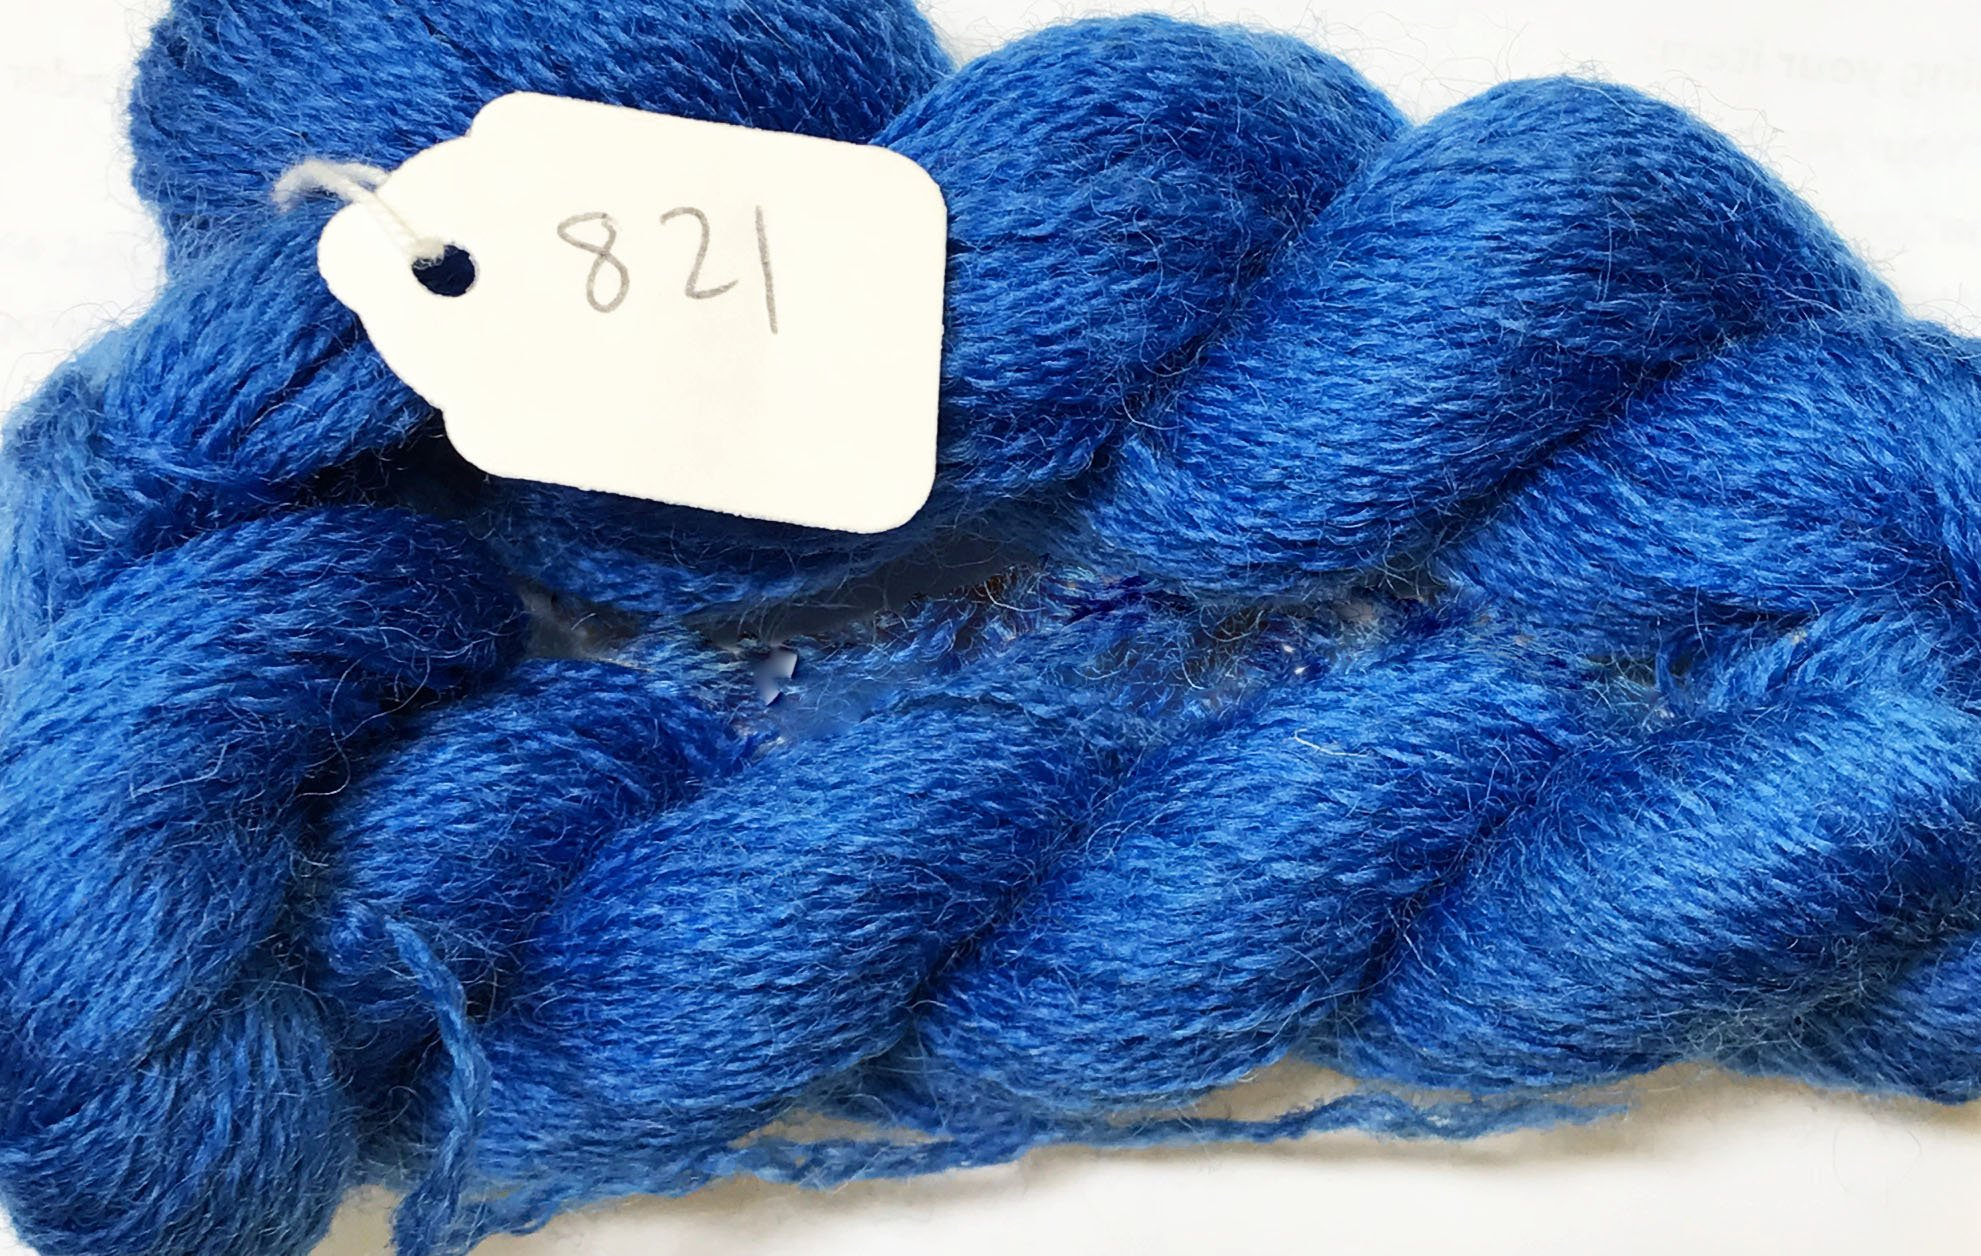 APP-821-ROYAL BLUE-HANK